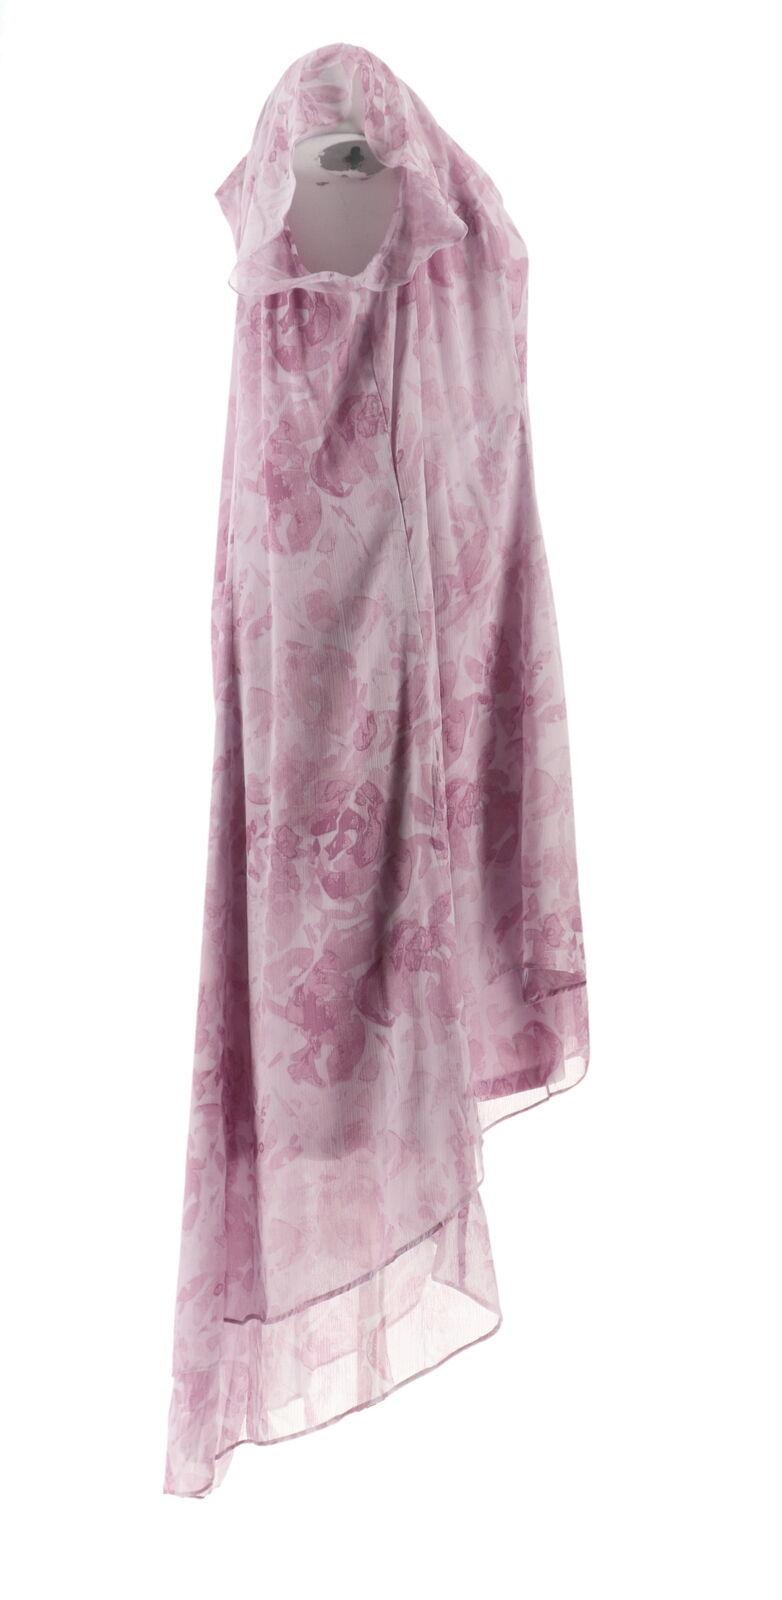 H Halston Petite Rose Print Cap Slv Hi-Low Dress French Lilac 24P NEW A303199 image 4